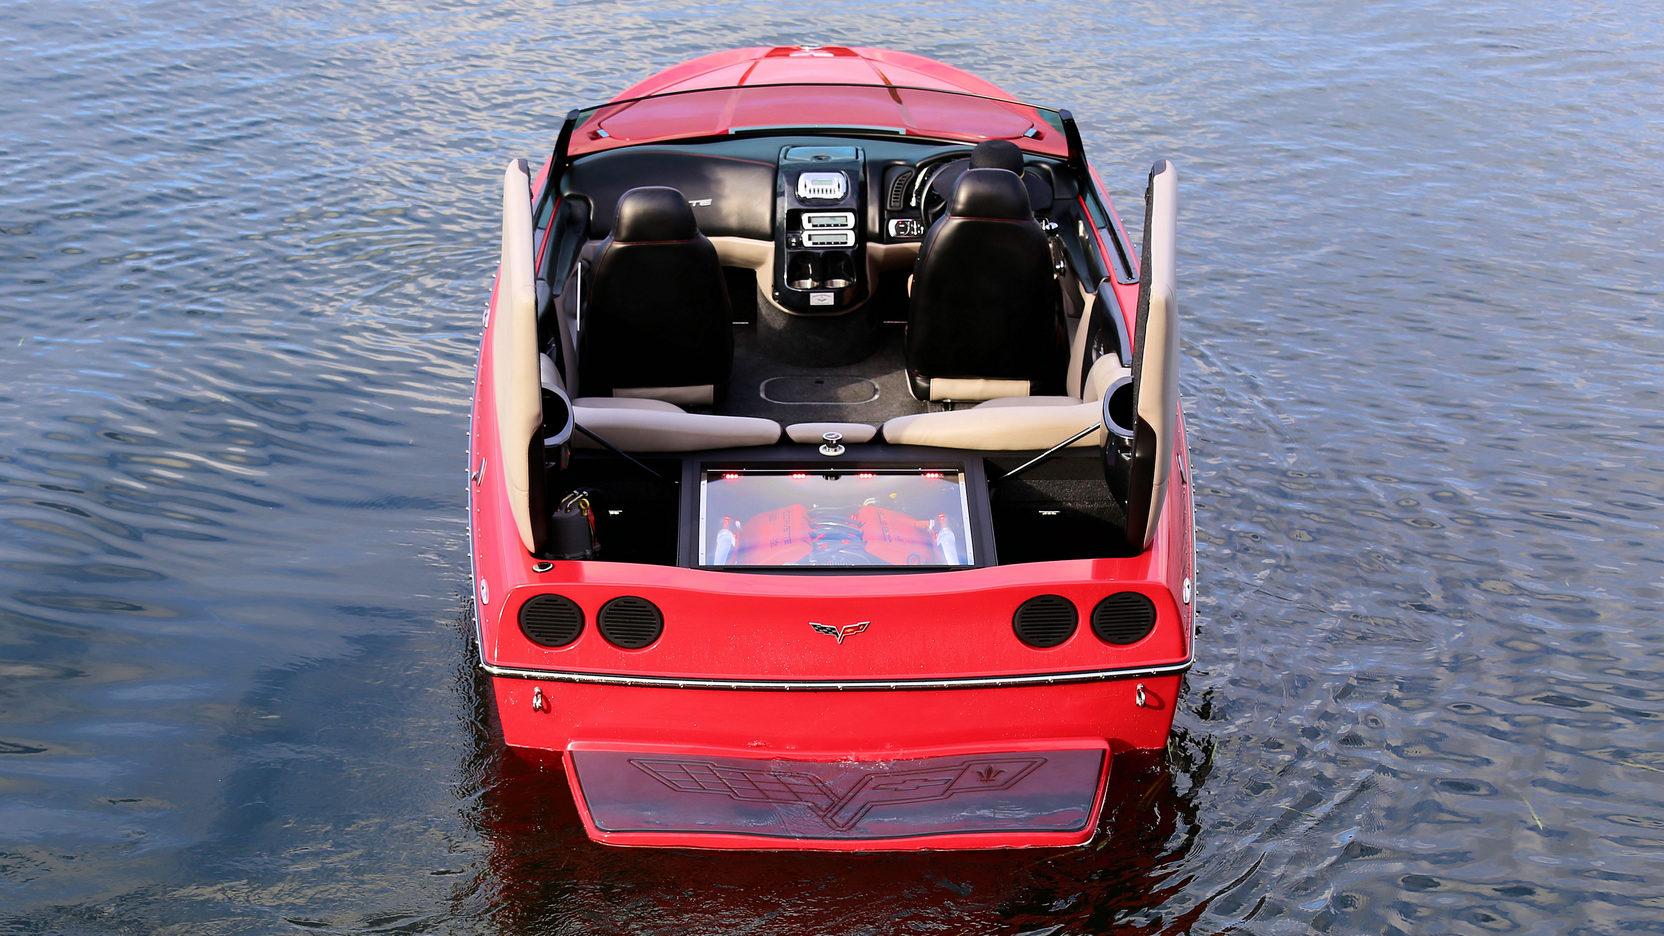 2008 Malibu Corvette Z06 rear hatches